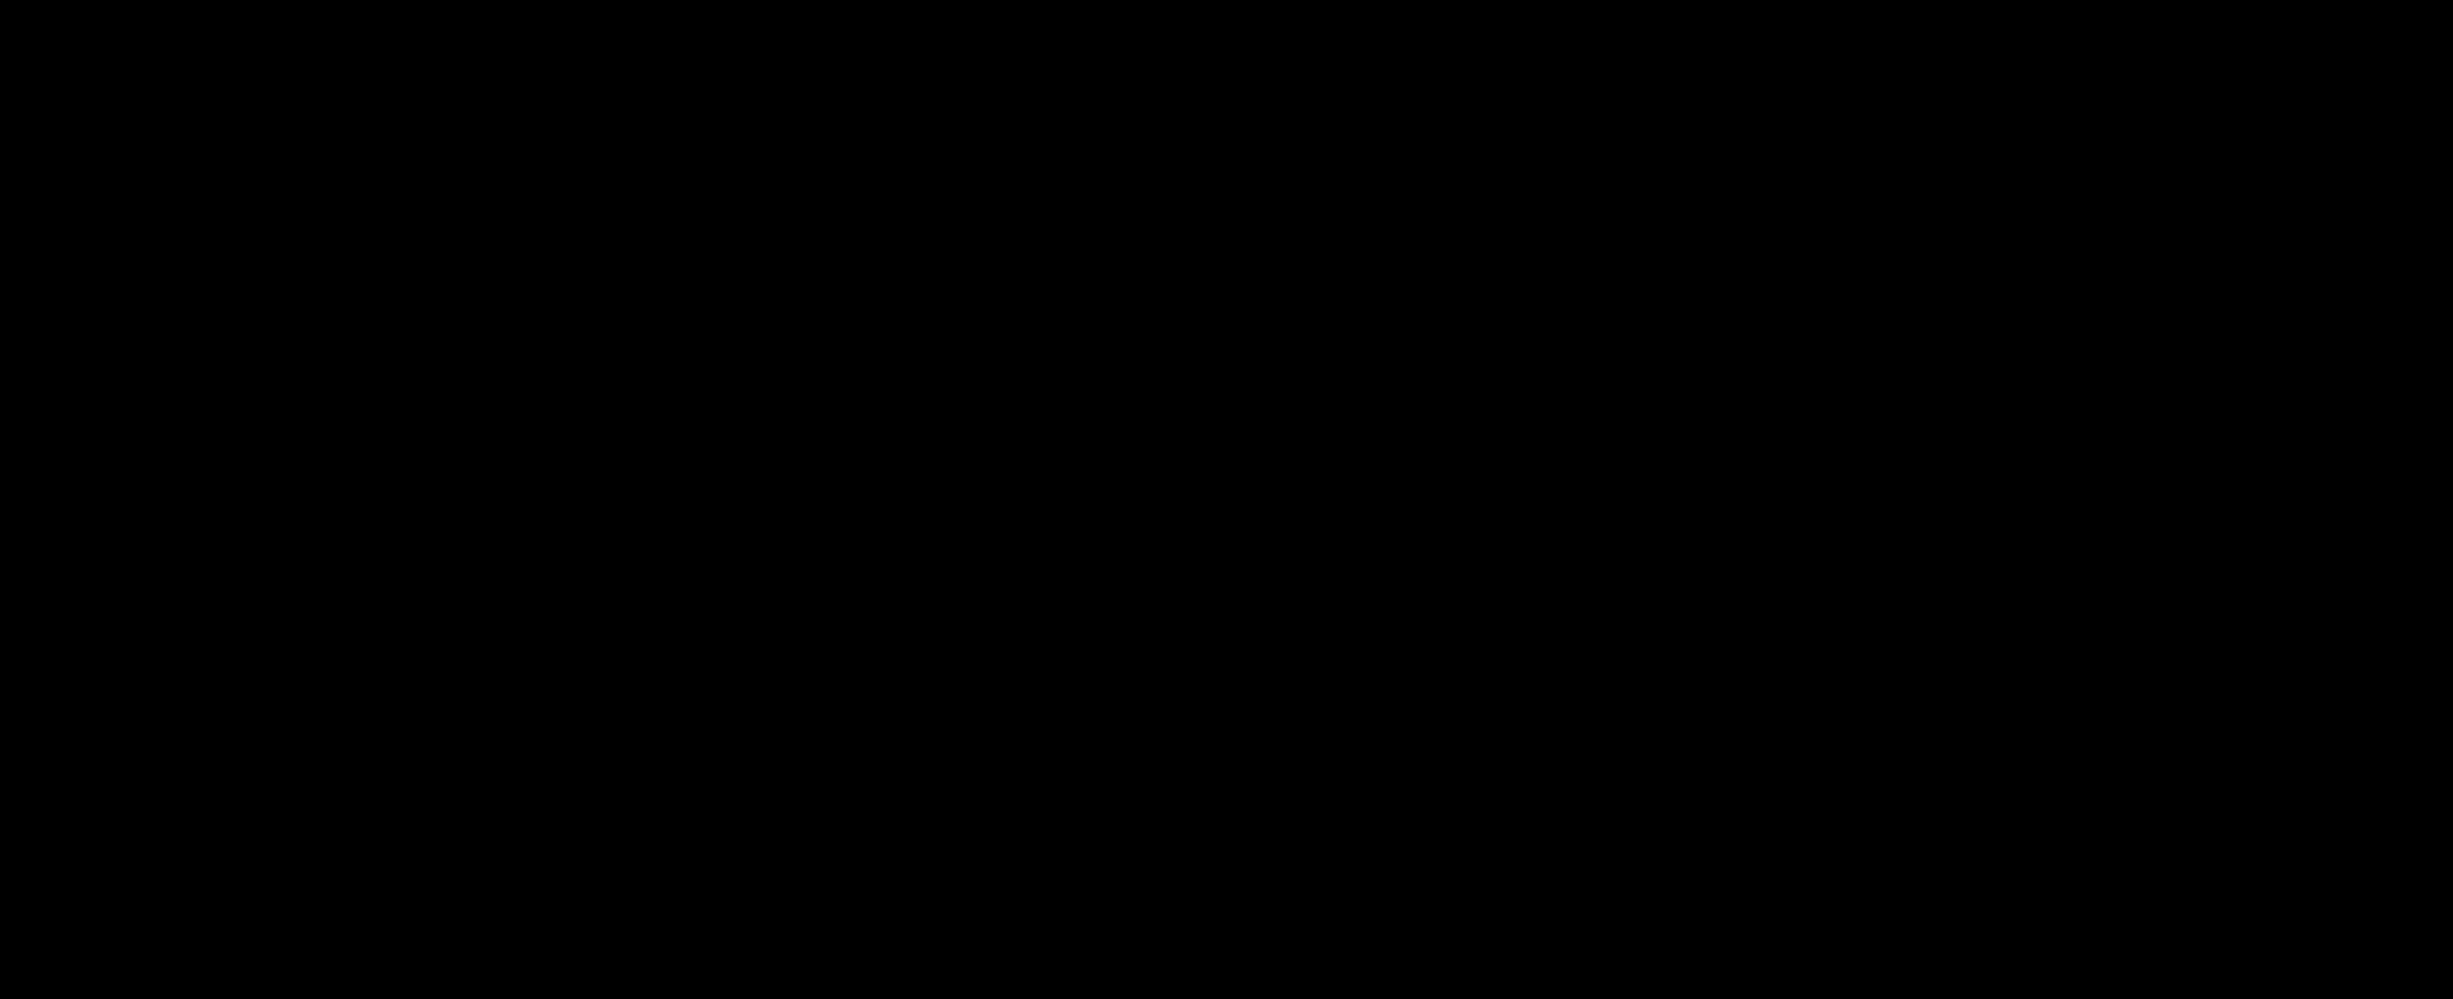 Primary Logo_Black-01.png